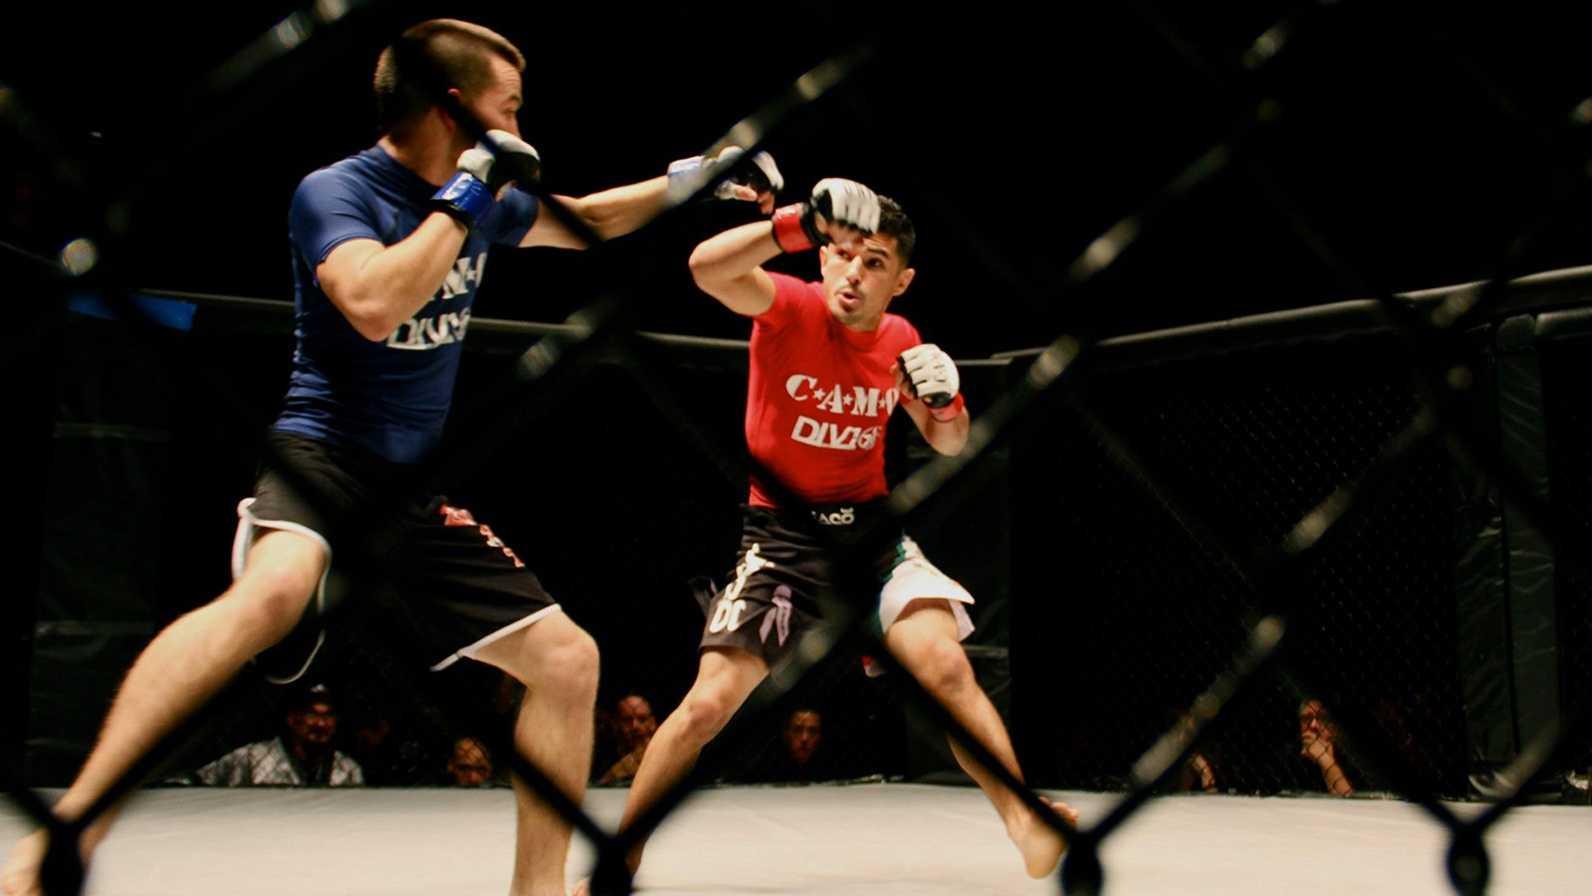 MMA fighters box in Santa Cruz.